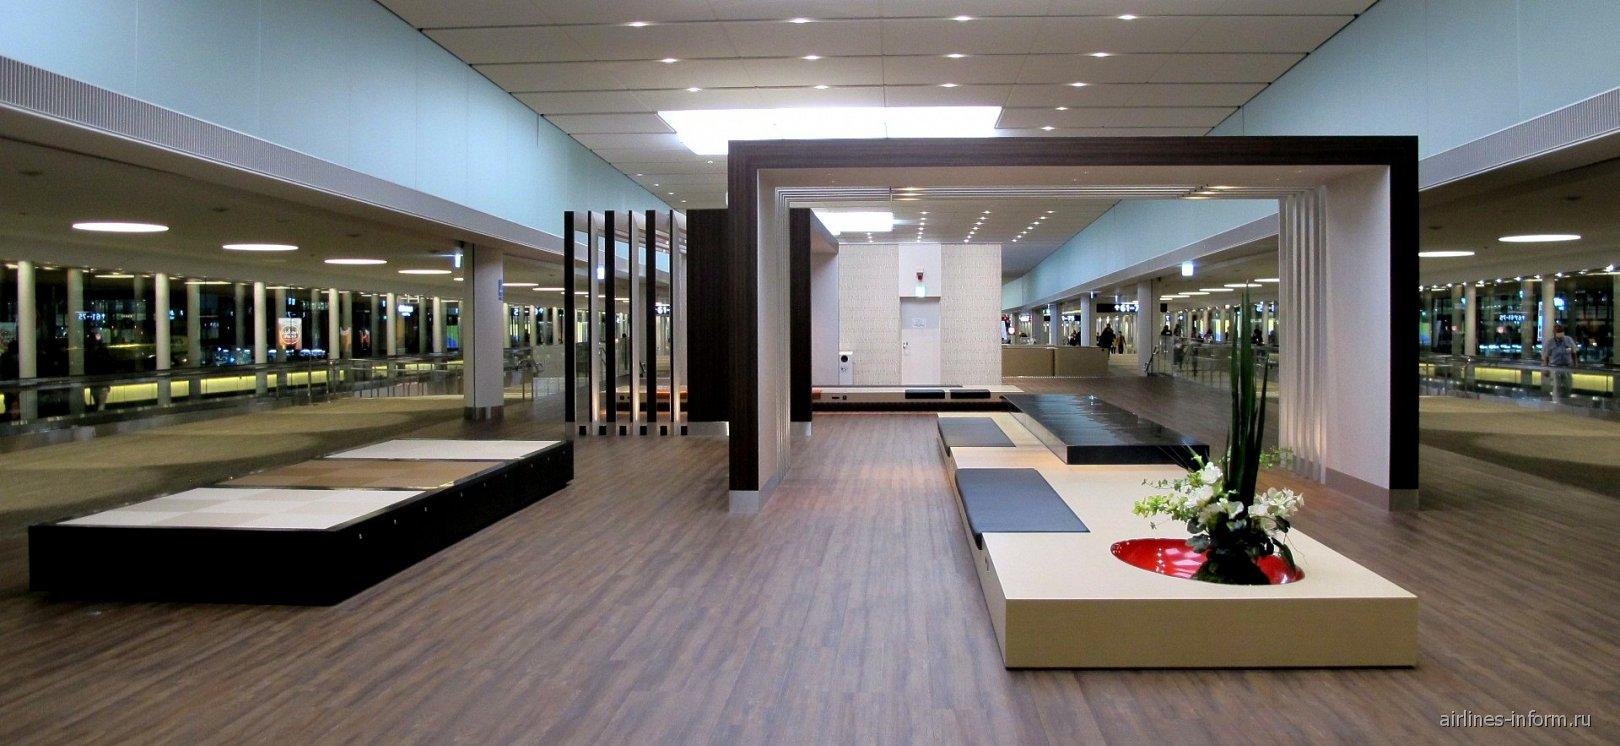 Зона отдыха Narita Sky Lounge в терминале 2 аэропорта Токио Нарита